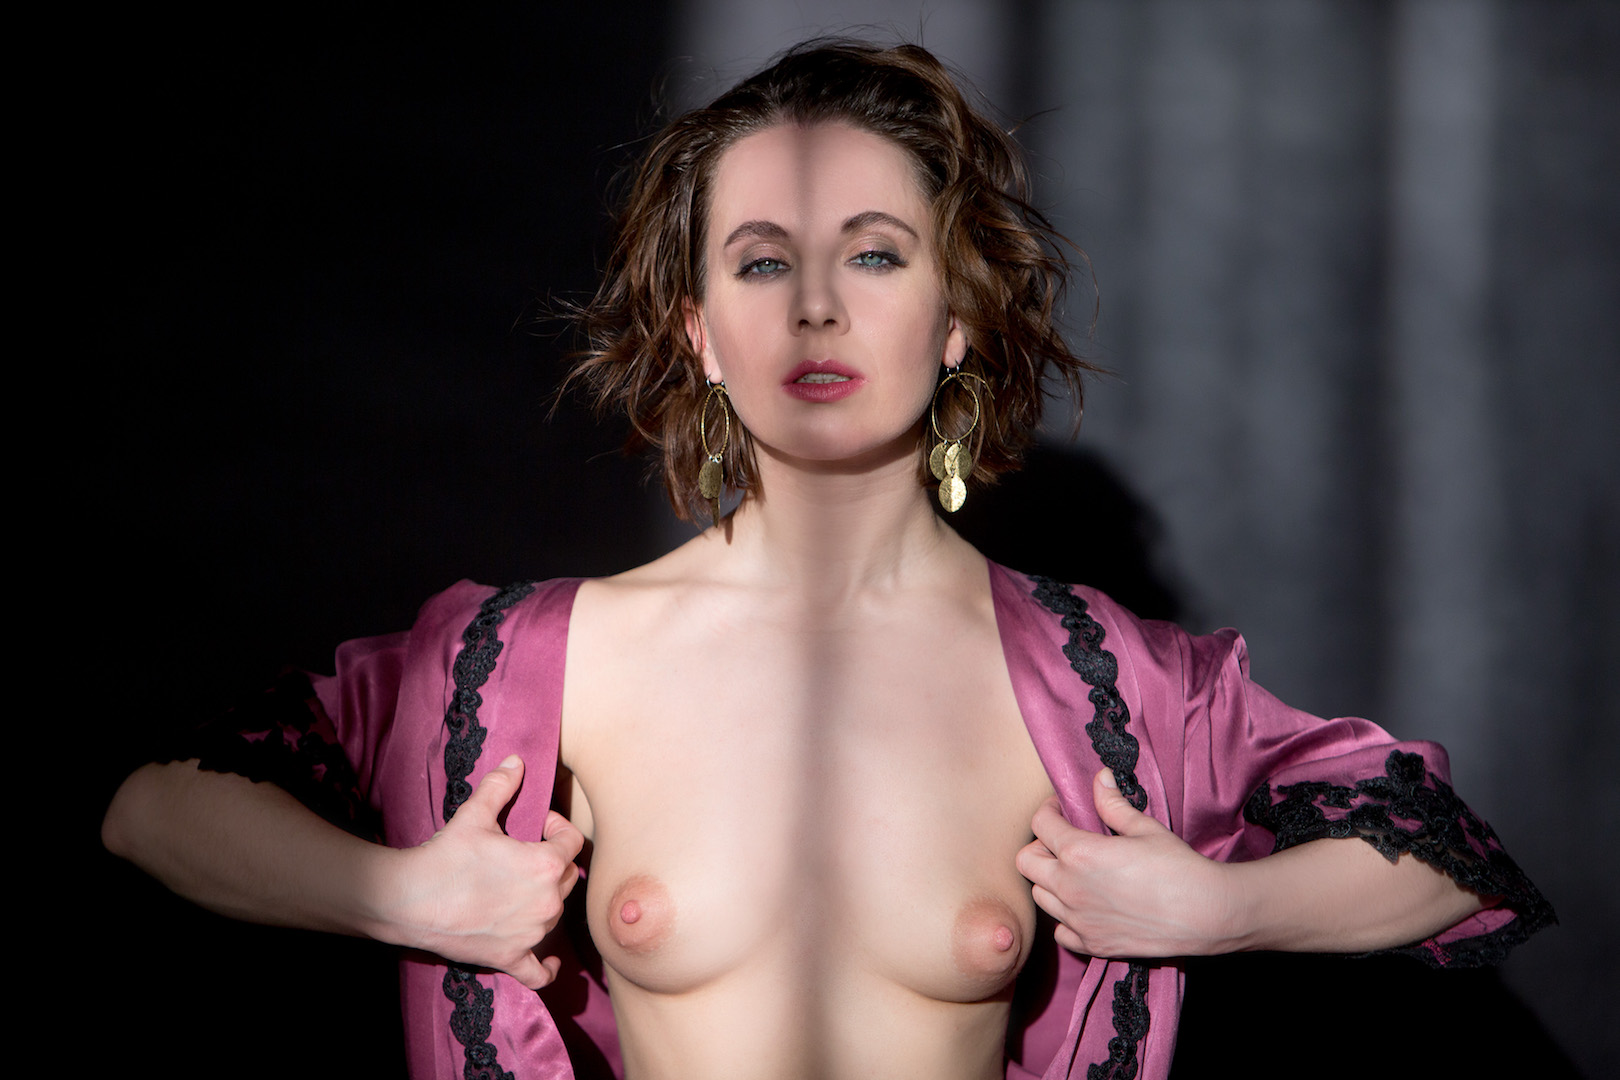 erotische geschichte kostenlos Kaarst